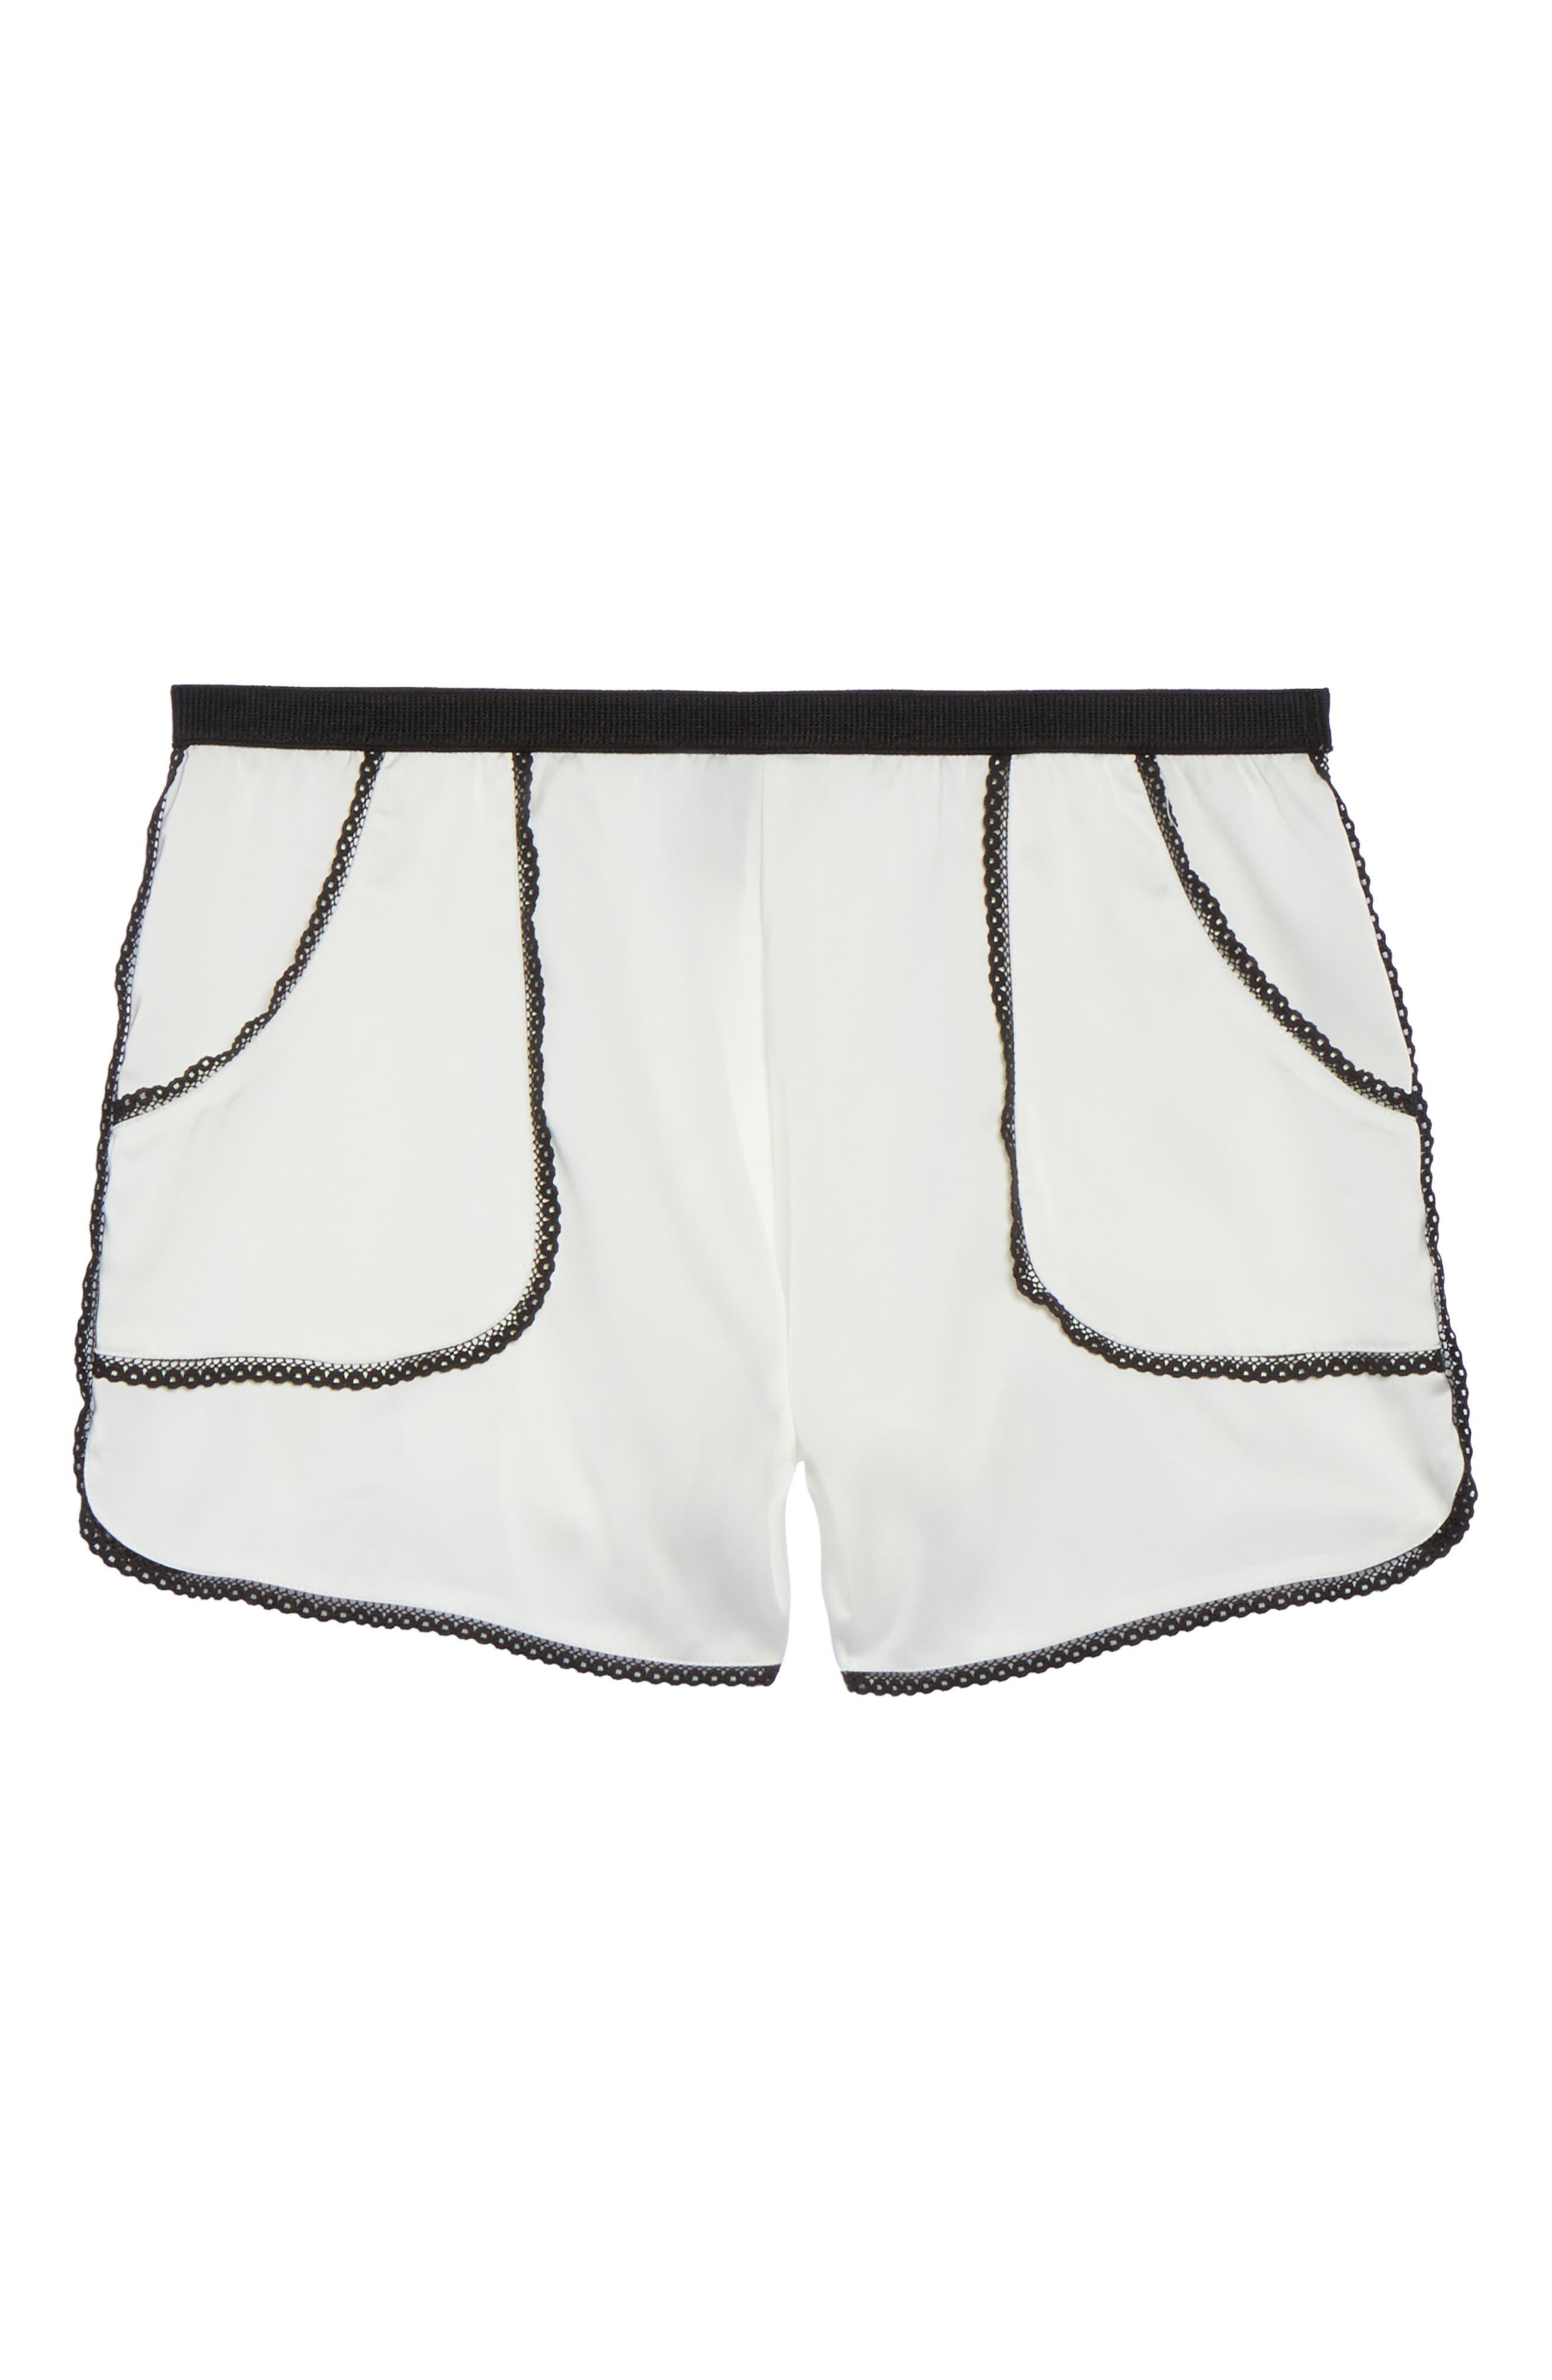 Thistle & Spire Devoe Satin Pajama Shorts,                             Alternate thumbnail 5, color,                             900